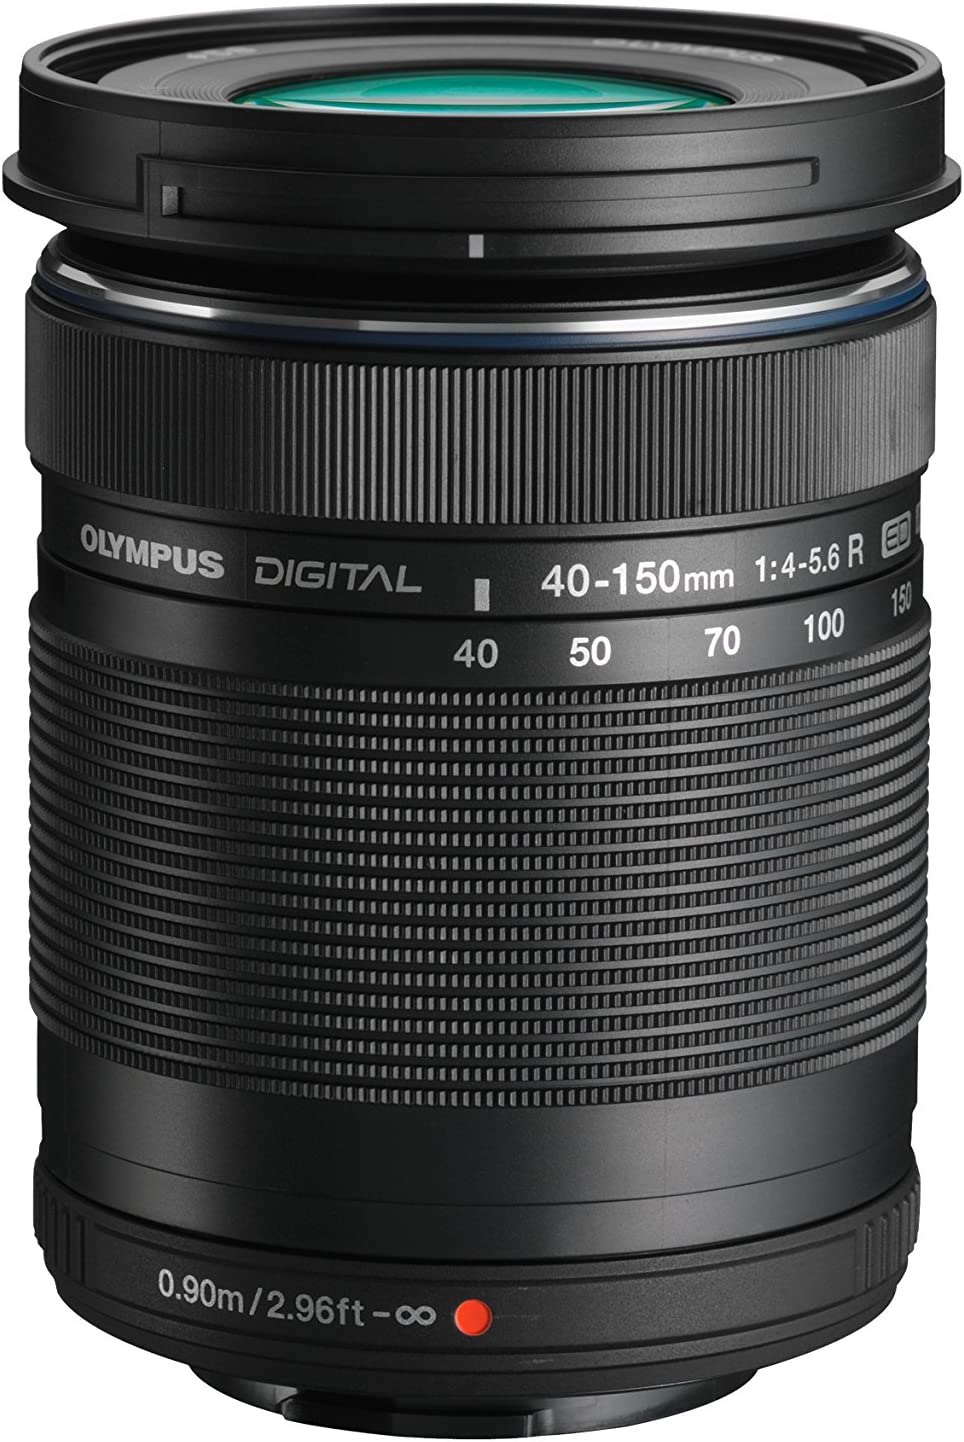 Olympus M.Zuiko Digital 40-150mm f/4.0-5.6 R - Objetivo para Micro Cuatro tercios (Apertura f/4, Zoom óptico 3.8X,diámetro: 58mm), Color Negro + Funda Adaptable OM-D